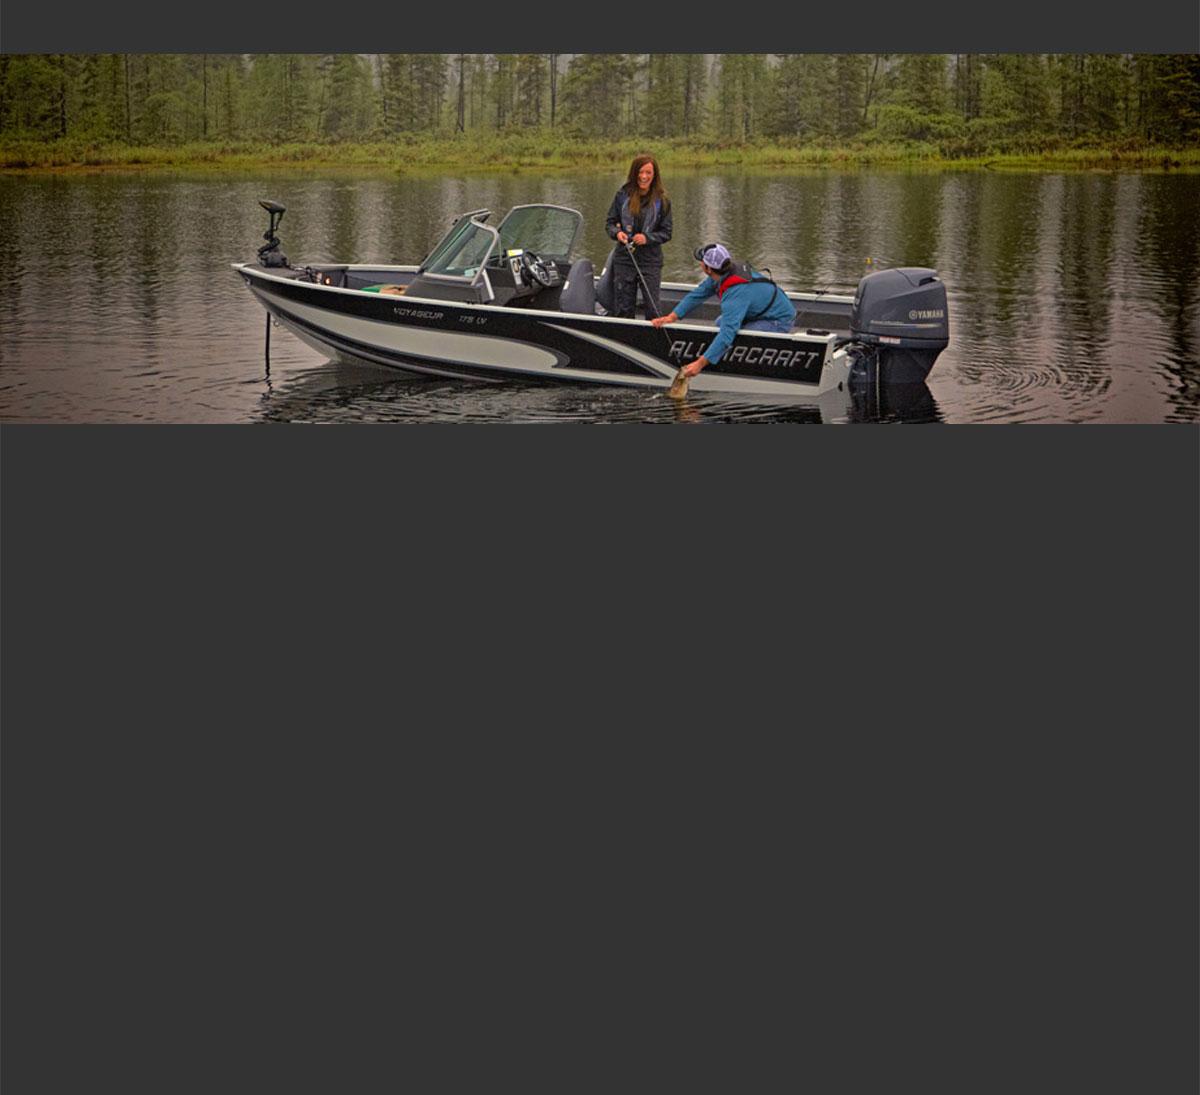 Truman Lake Marine & Powersportsllc - Used Motor Boats For